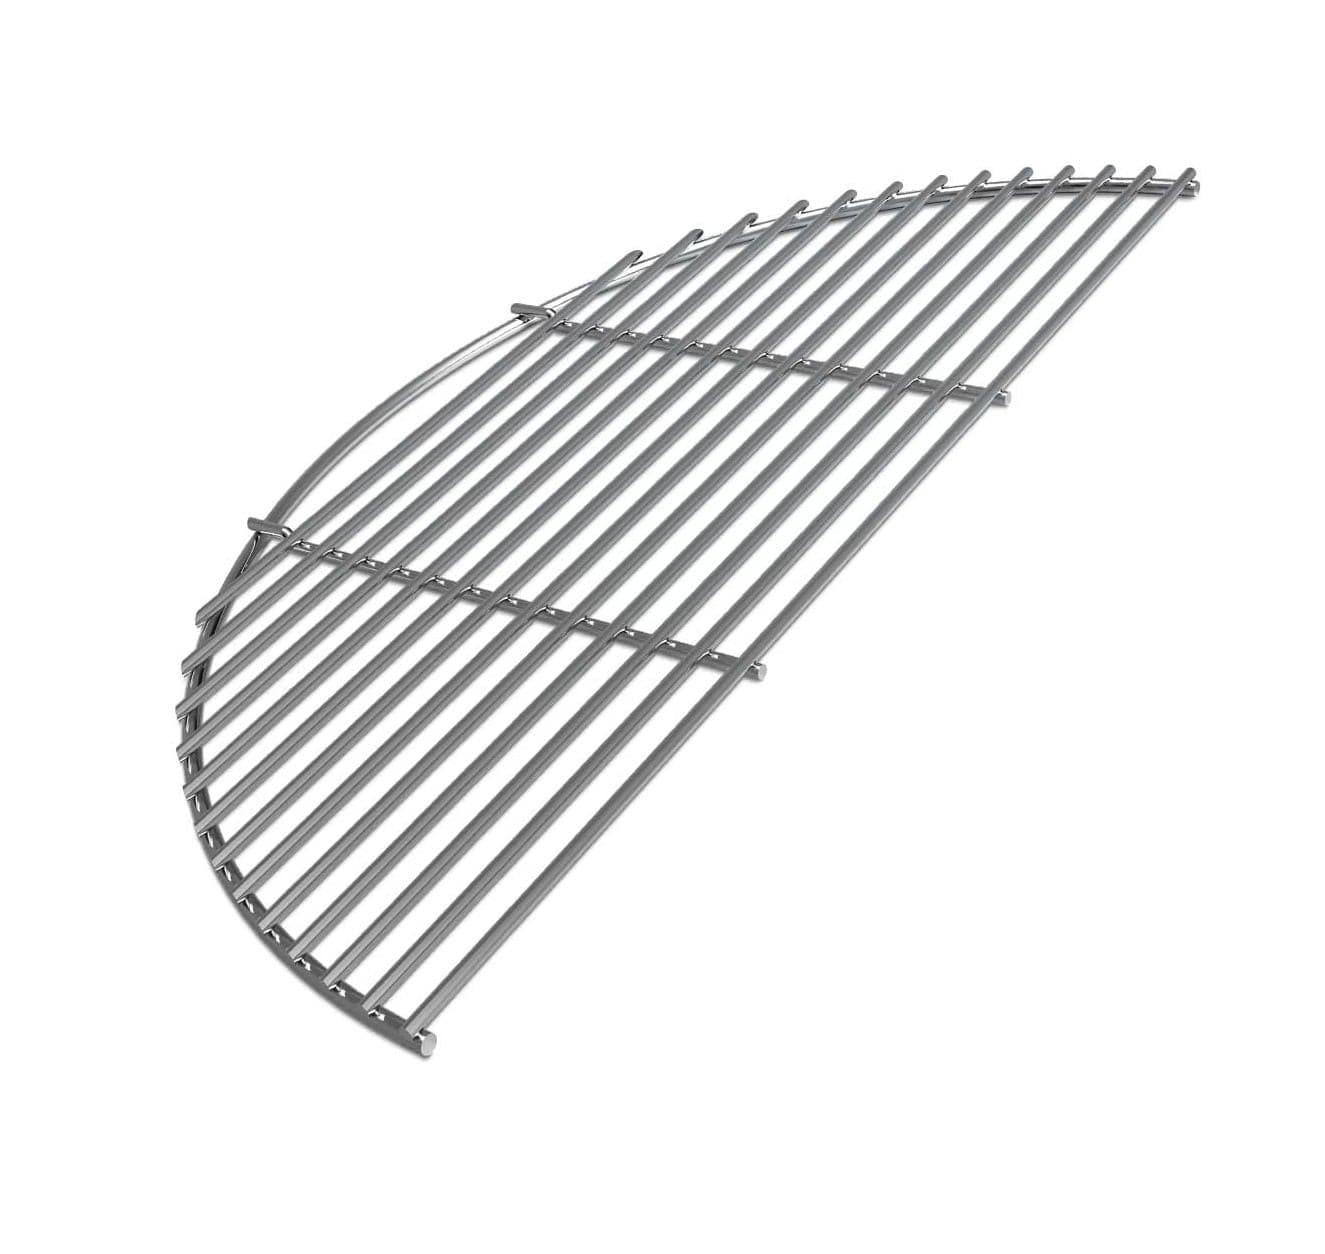 Stainless Steel Half Grid L